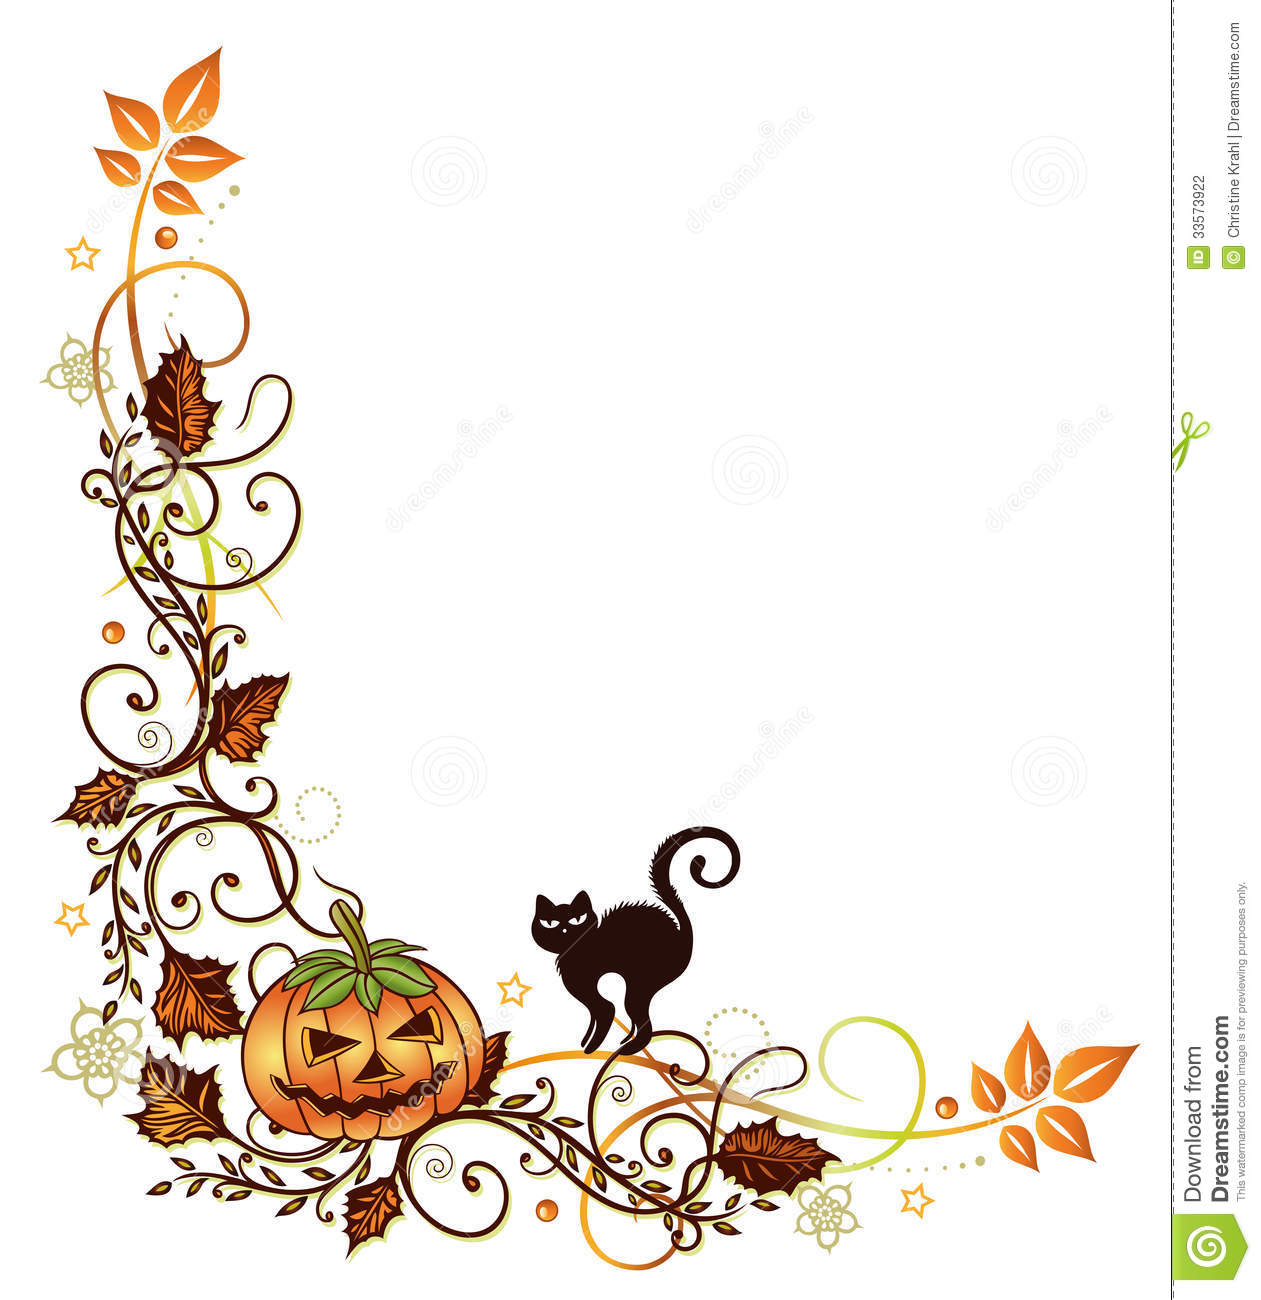 halloween border clipart - Halloween Border Clip Art